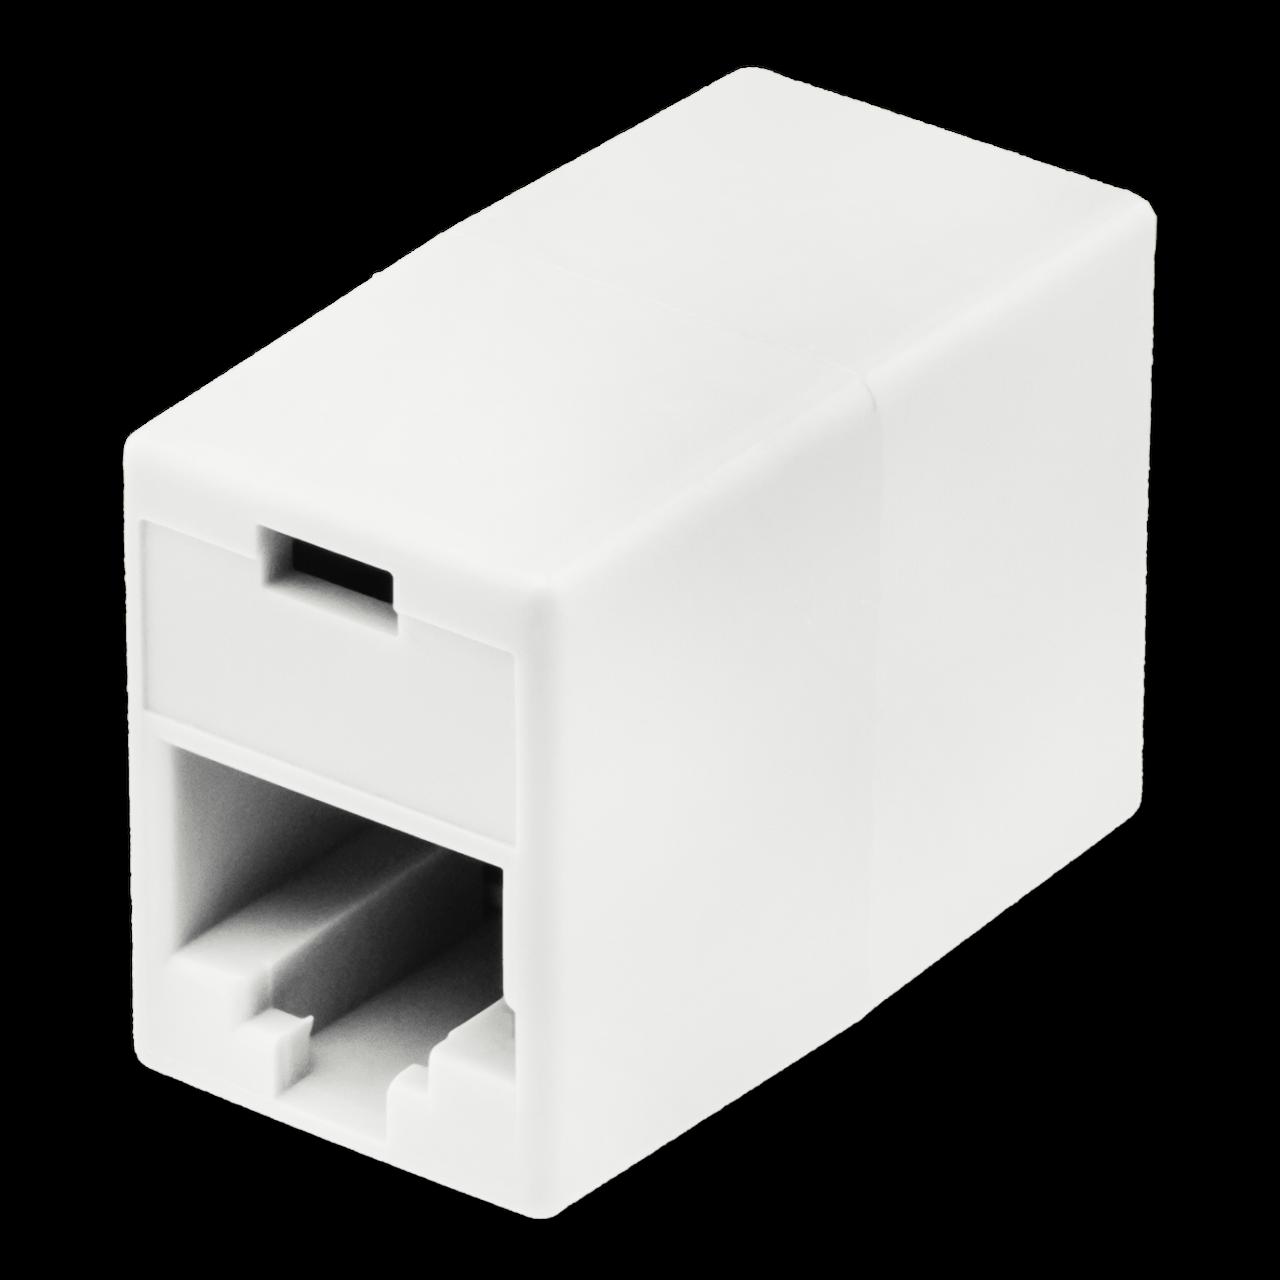 Соединительная коробка LogicPower UTP 2хRJ-45 кат.5Е LP-LNG-350 (5 шт)